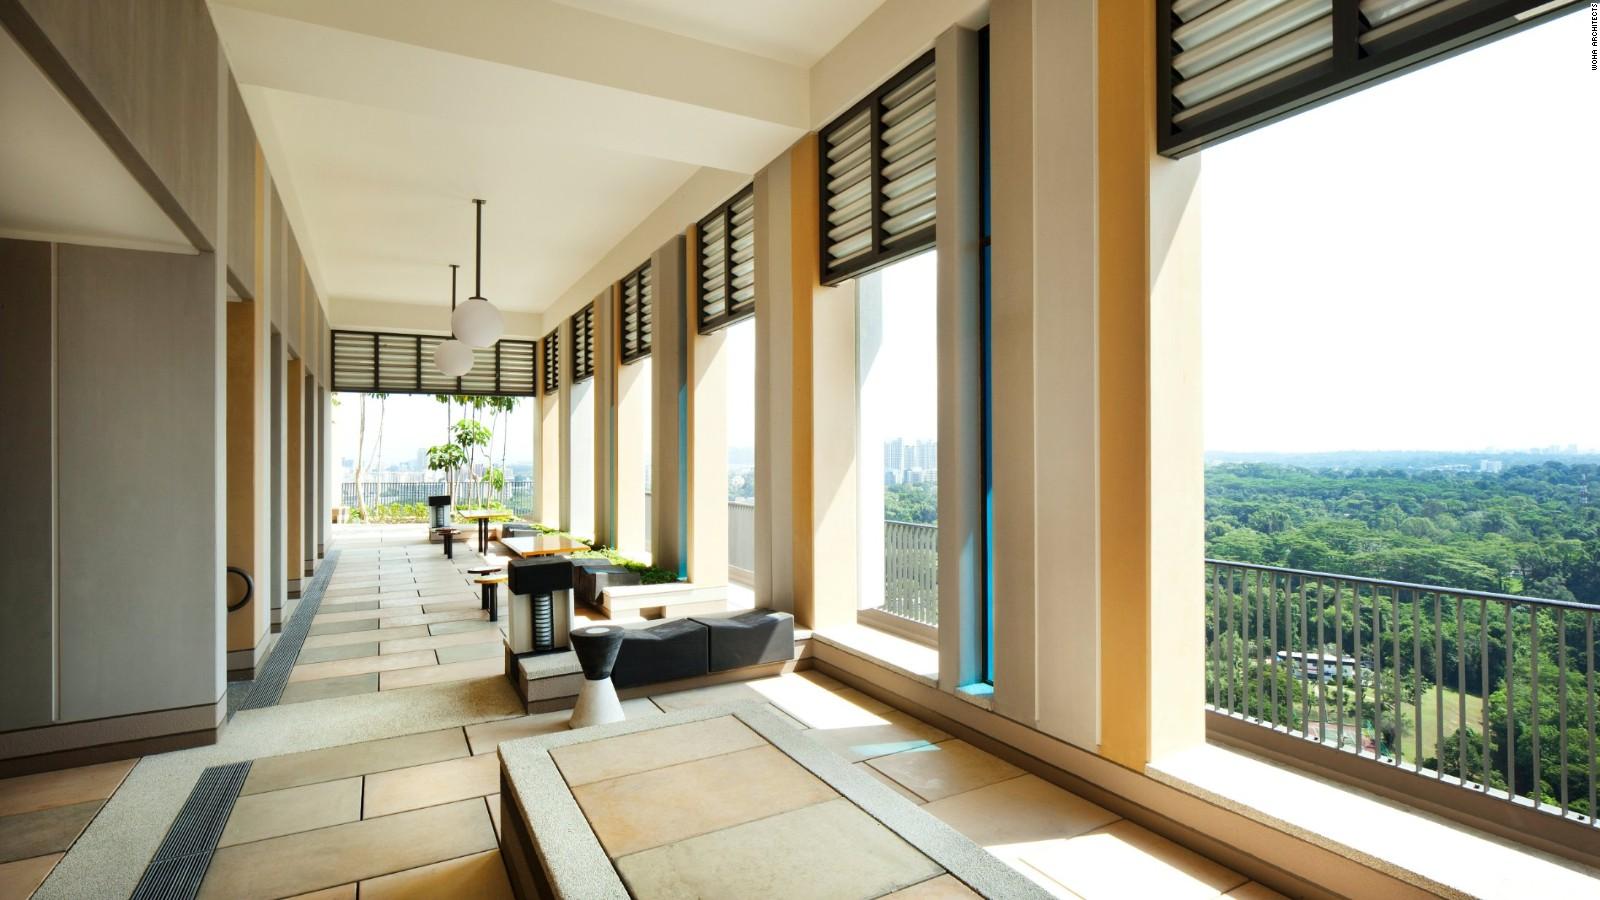 Luxury Hotel No Public Housing Singapore Style Cnn 2 Way Switch